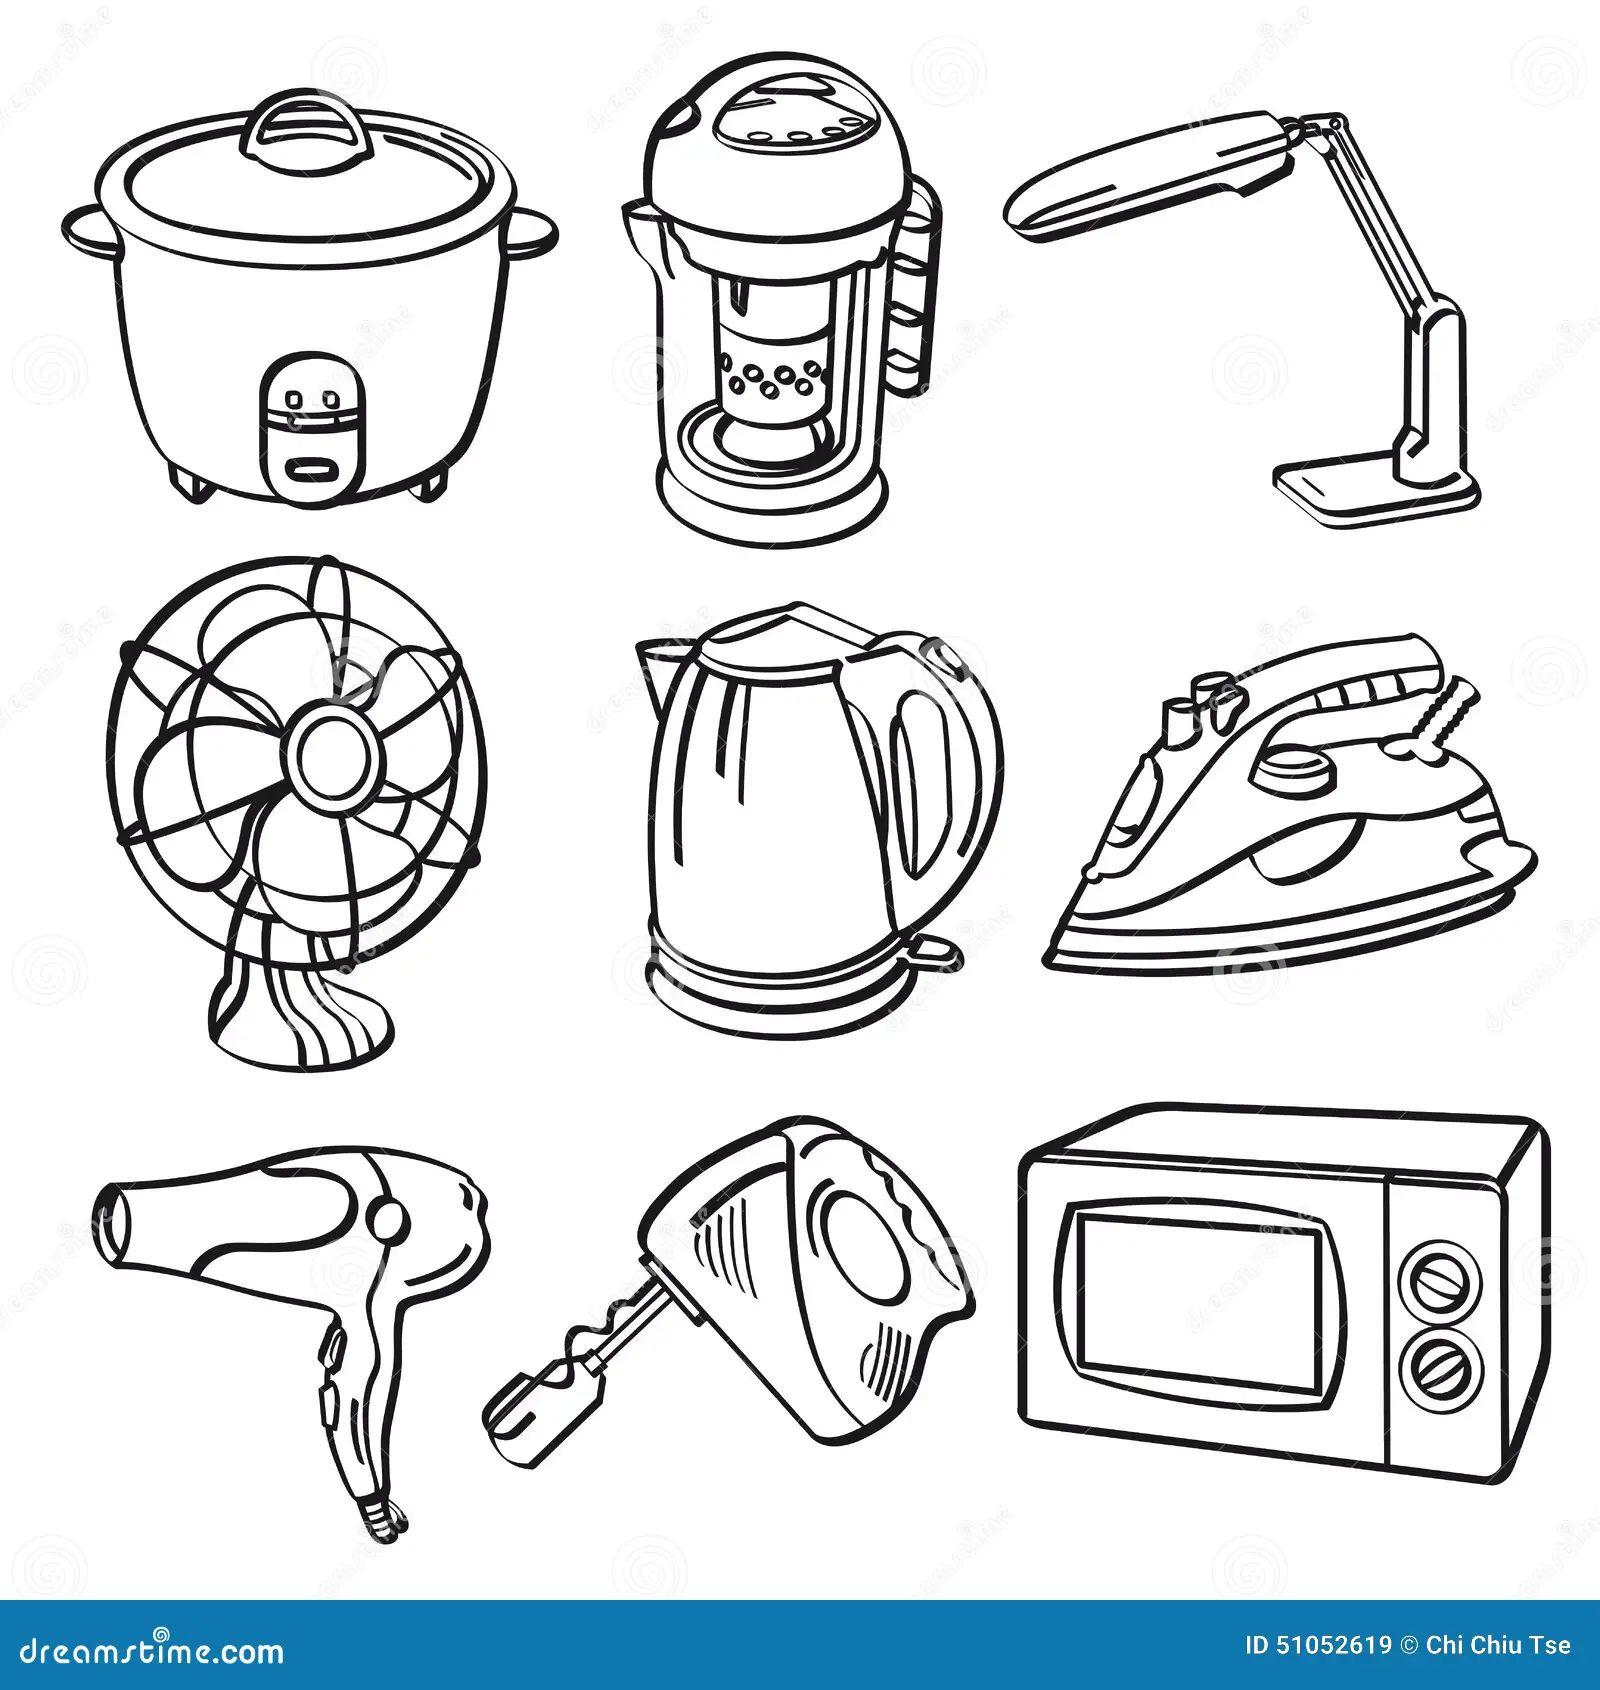 house electrical symbols illustrator